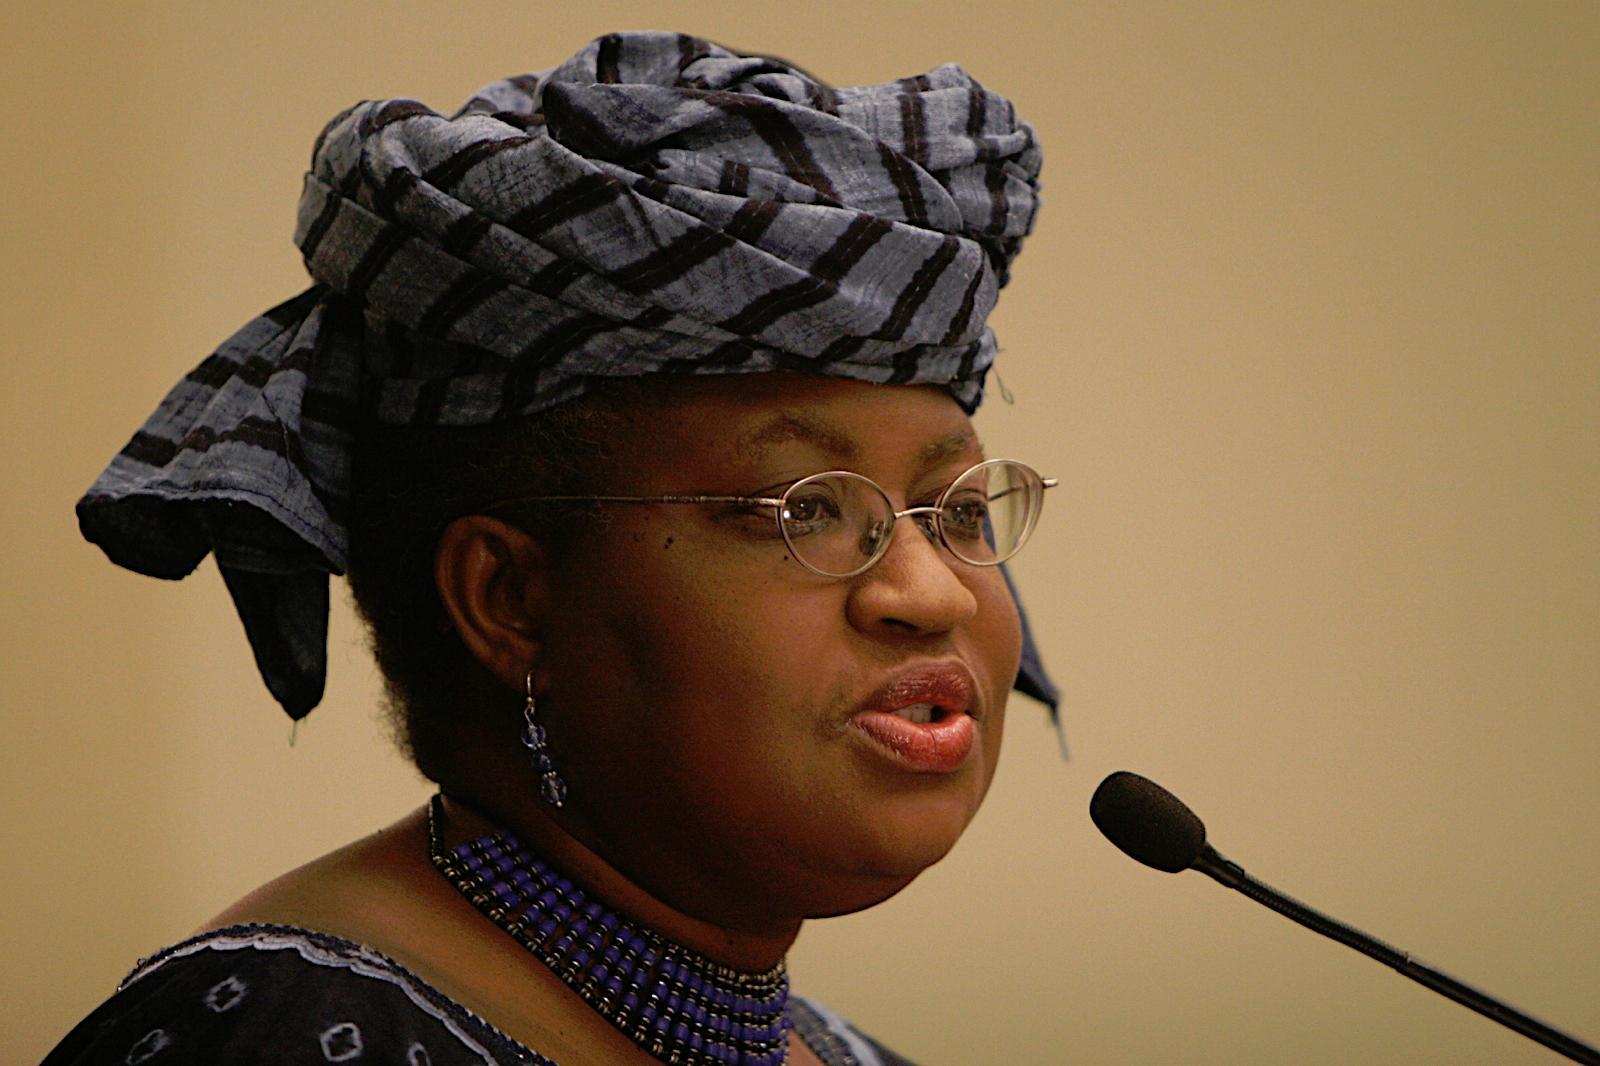 Corrupt people use NGOs as a front – Ngozi Okonjo-Iweala